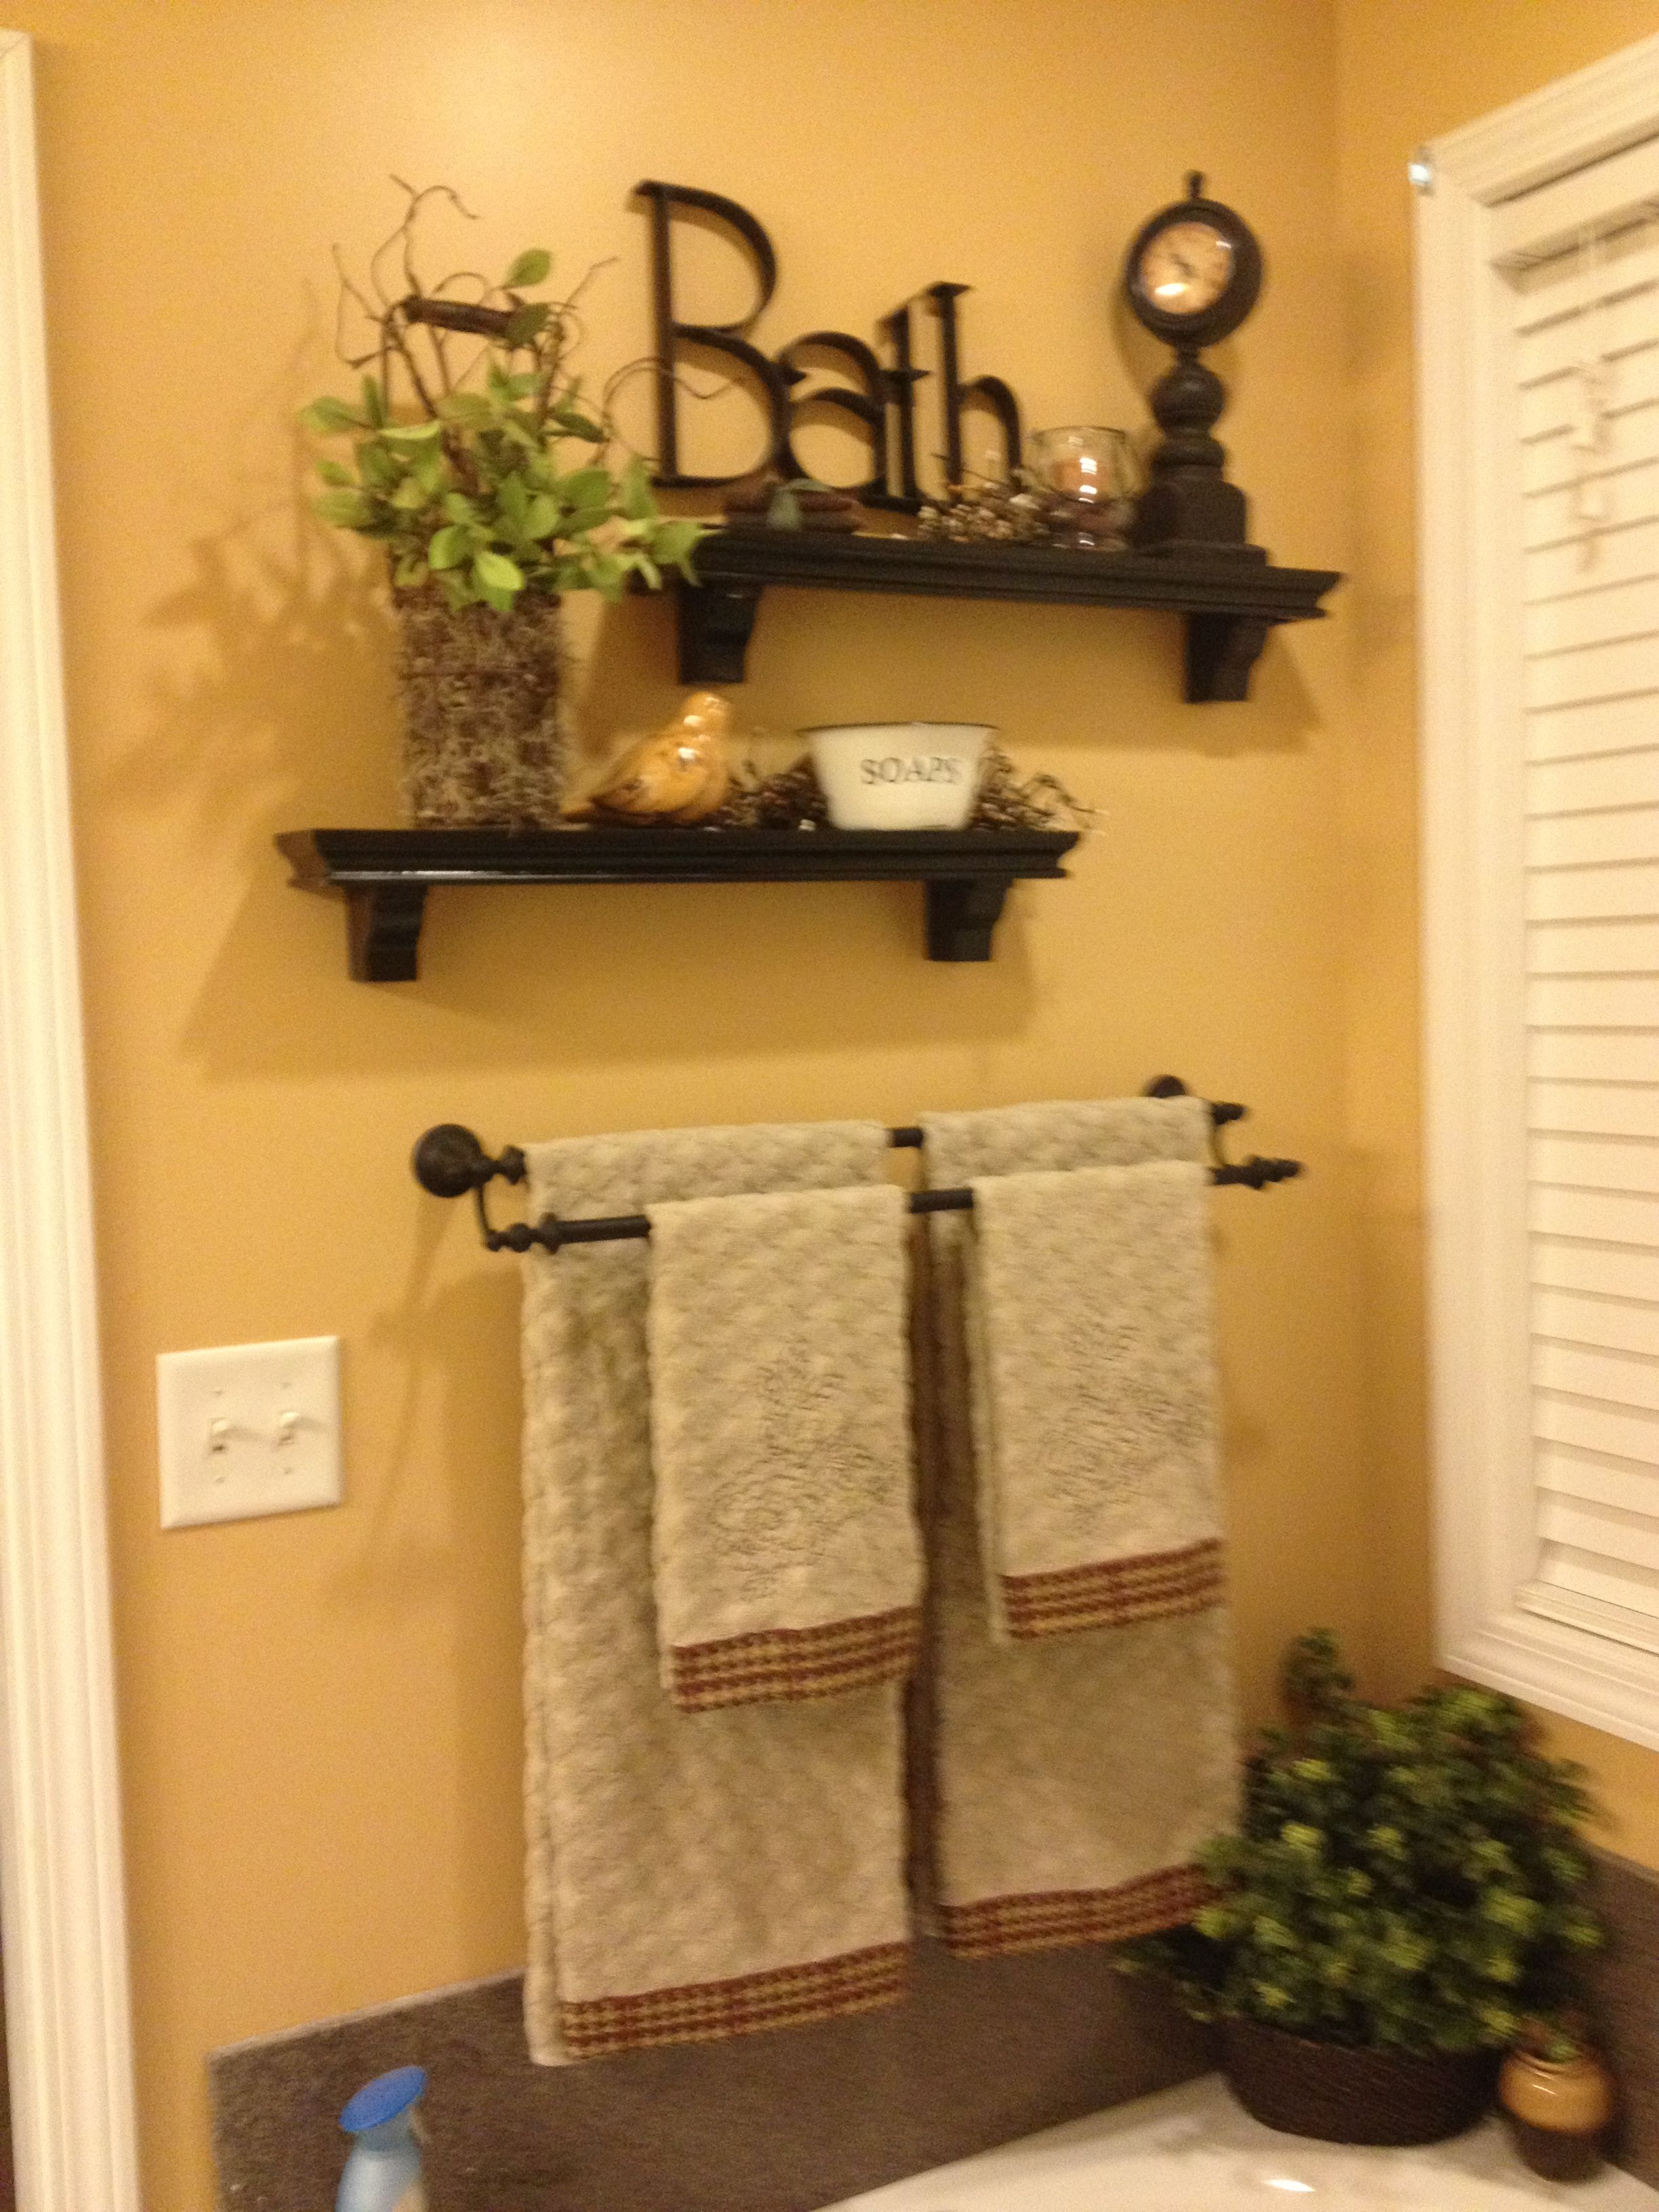 Wall Decor Ideas For Bathrooms